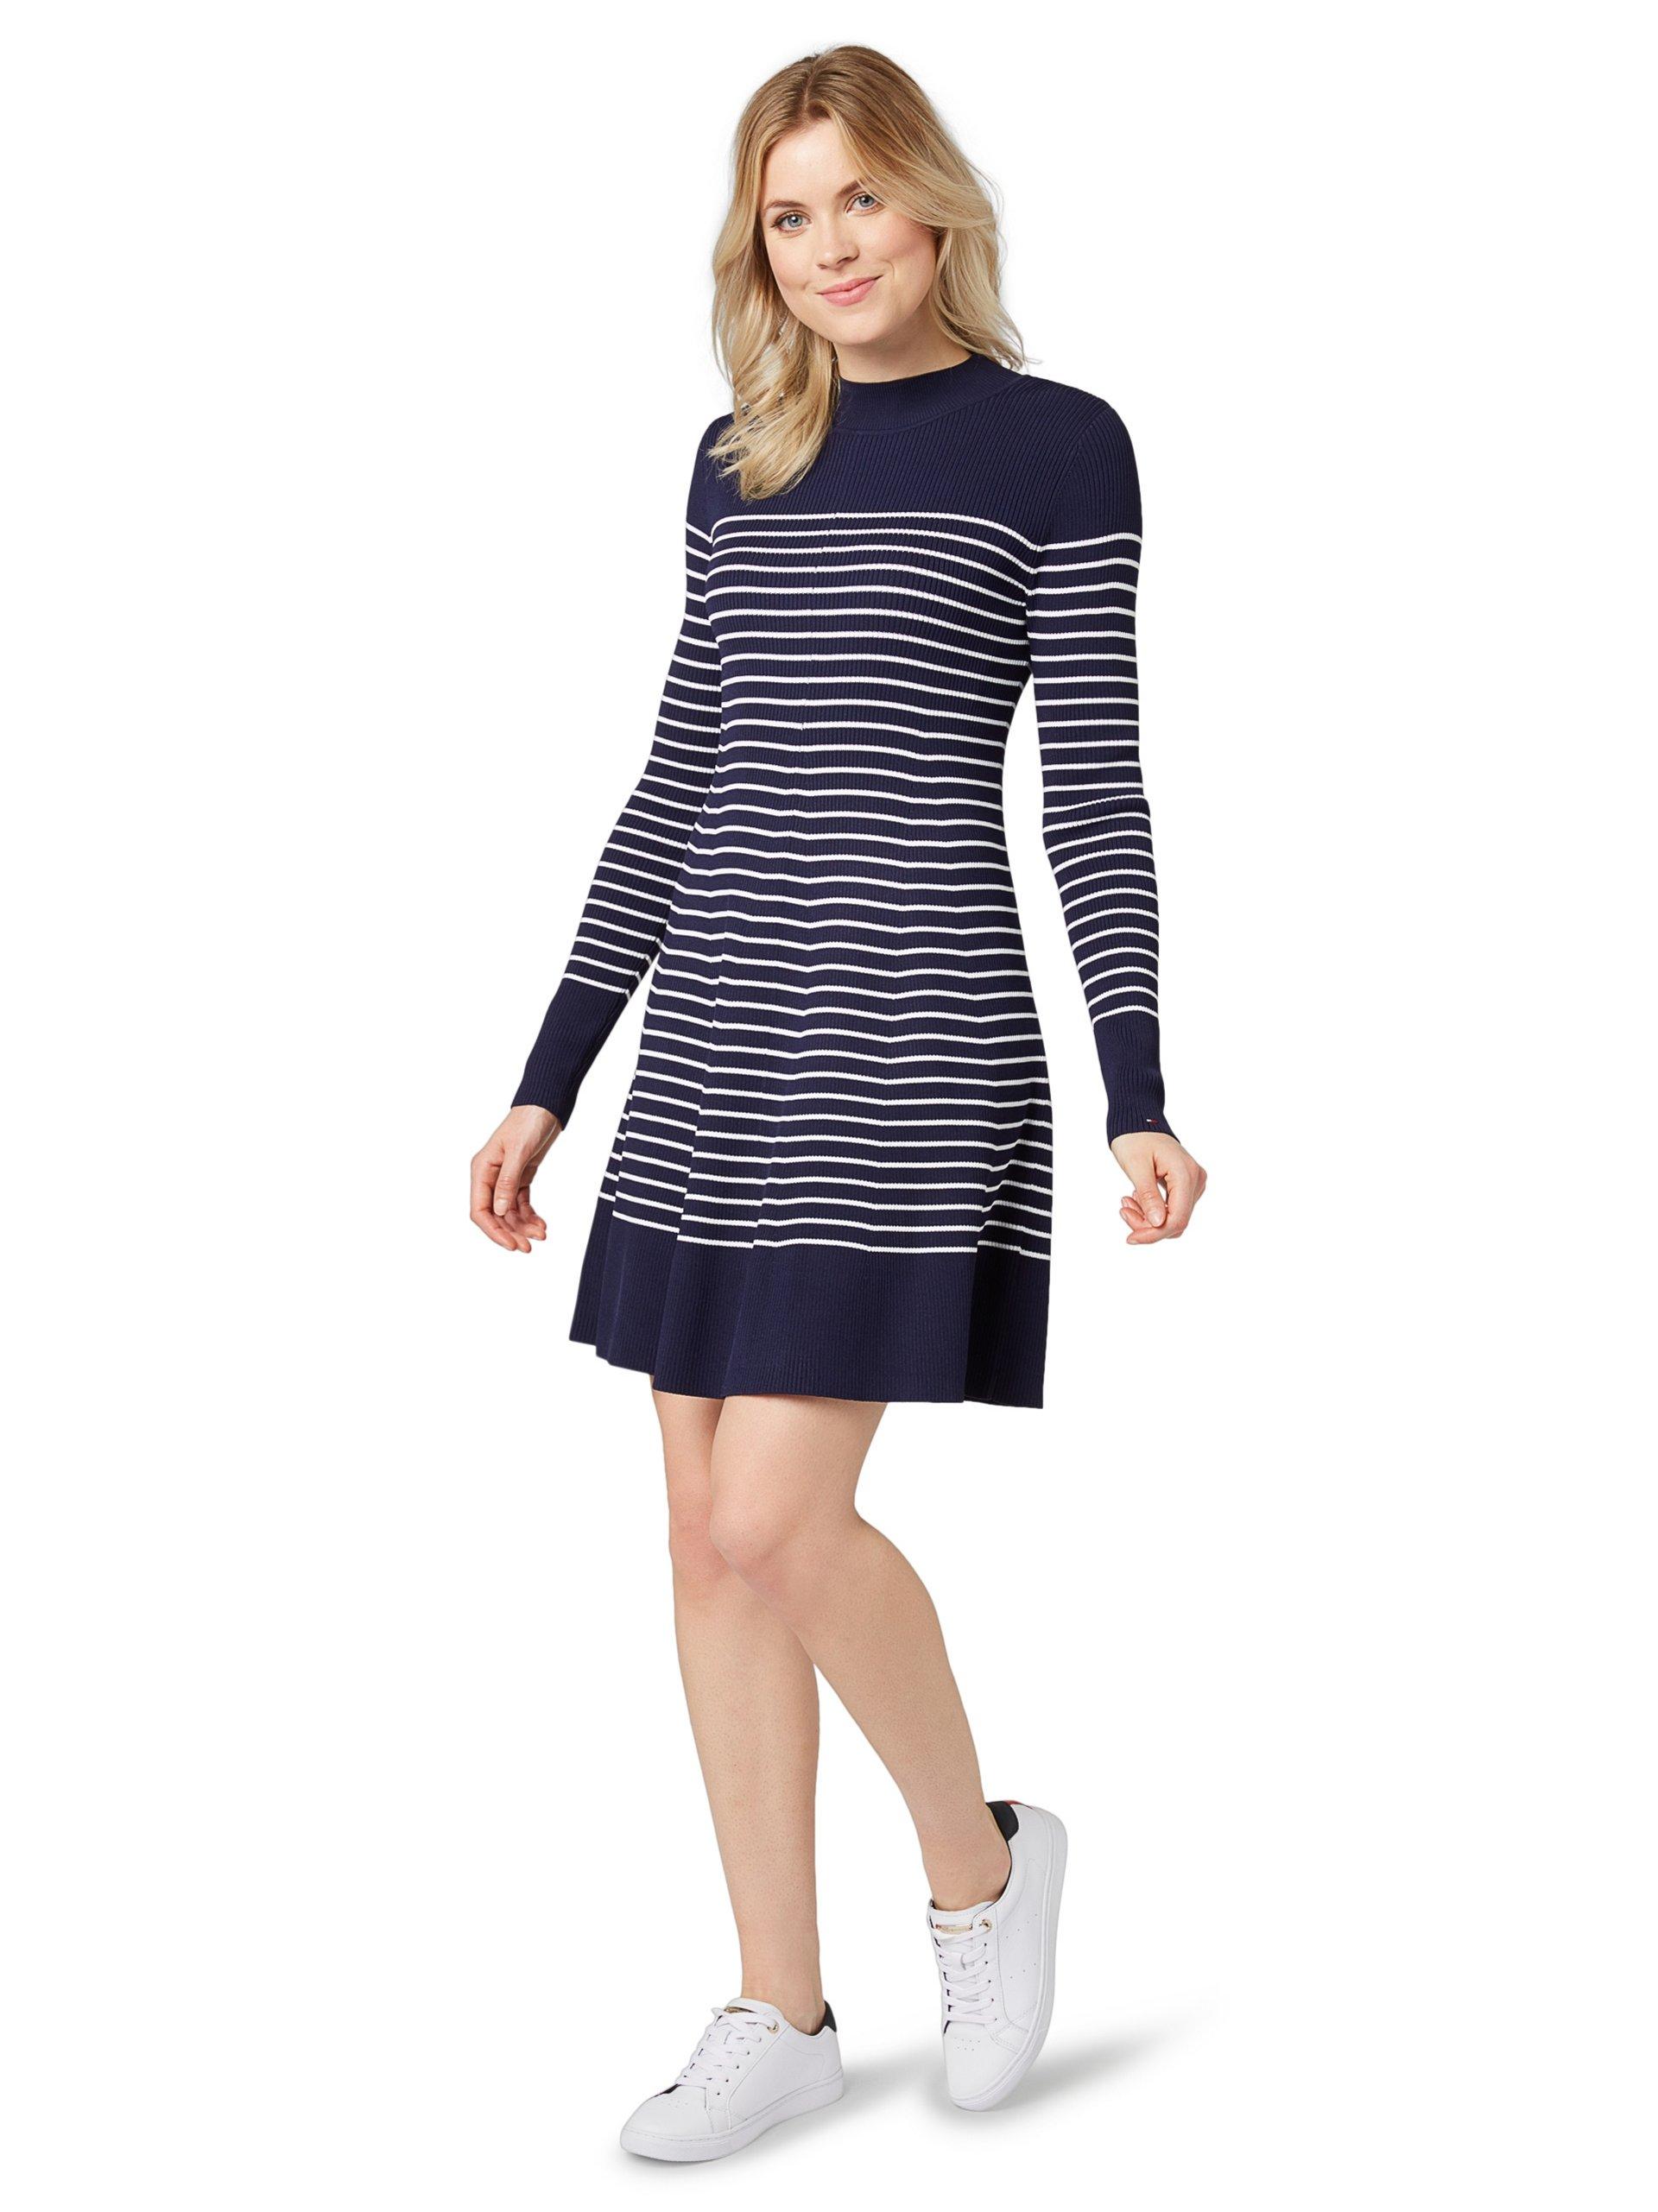 tommy hilfiger damen kleid wei gestreift online kaufen vangraaf com. Black Bedroom Furniture Sets. Home Design Ideas